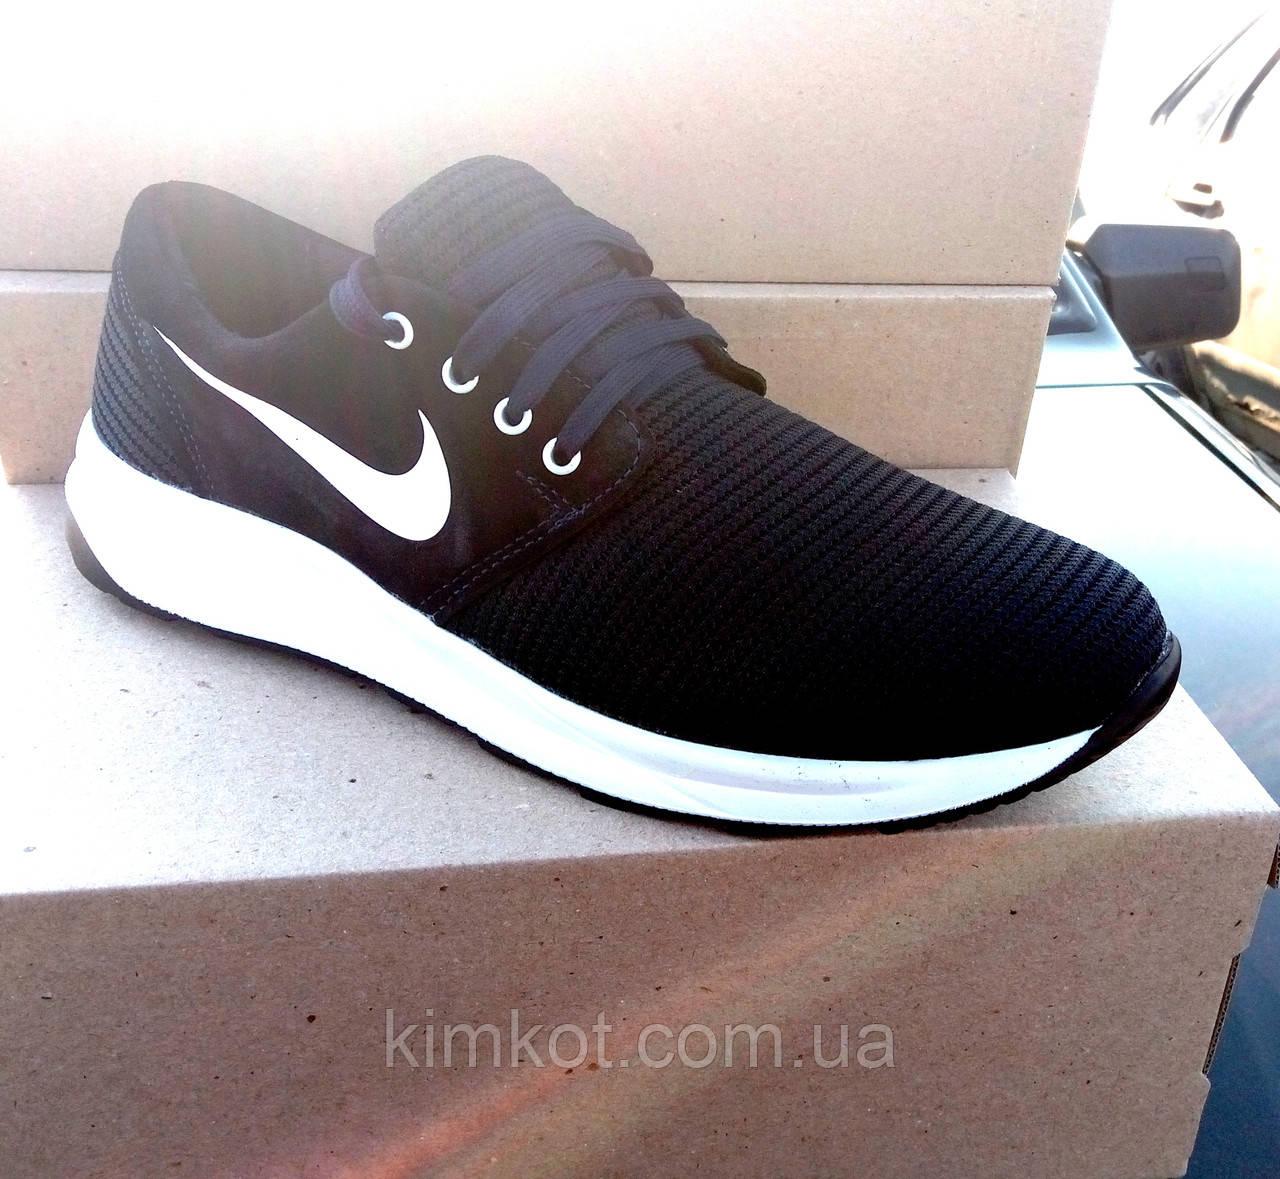 ac535fe2 Кроссовки мужские сетка Nike Roshe Ran 40 -45 р-р: продажа, цена в ...